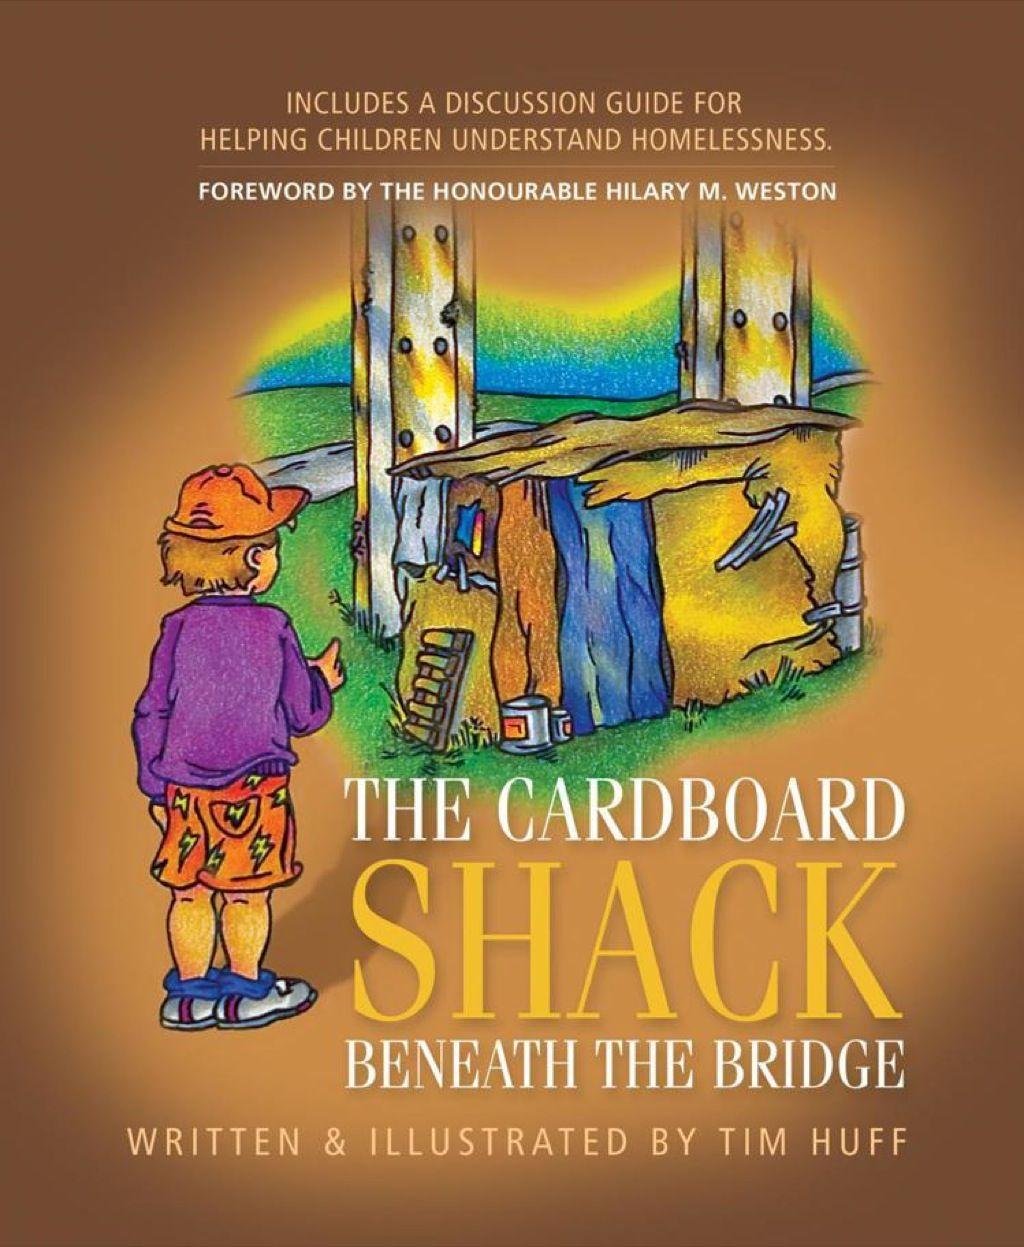 The Cardboard Shack Beneath The Bridge Ebook In